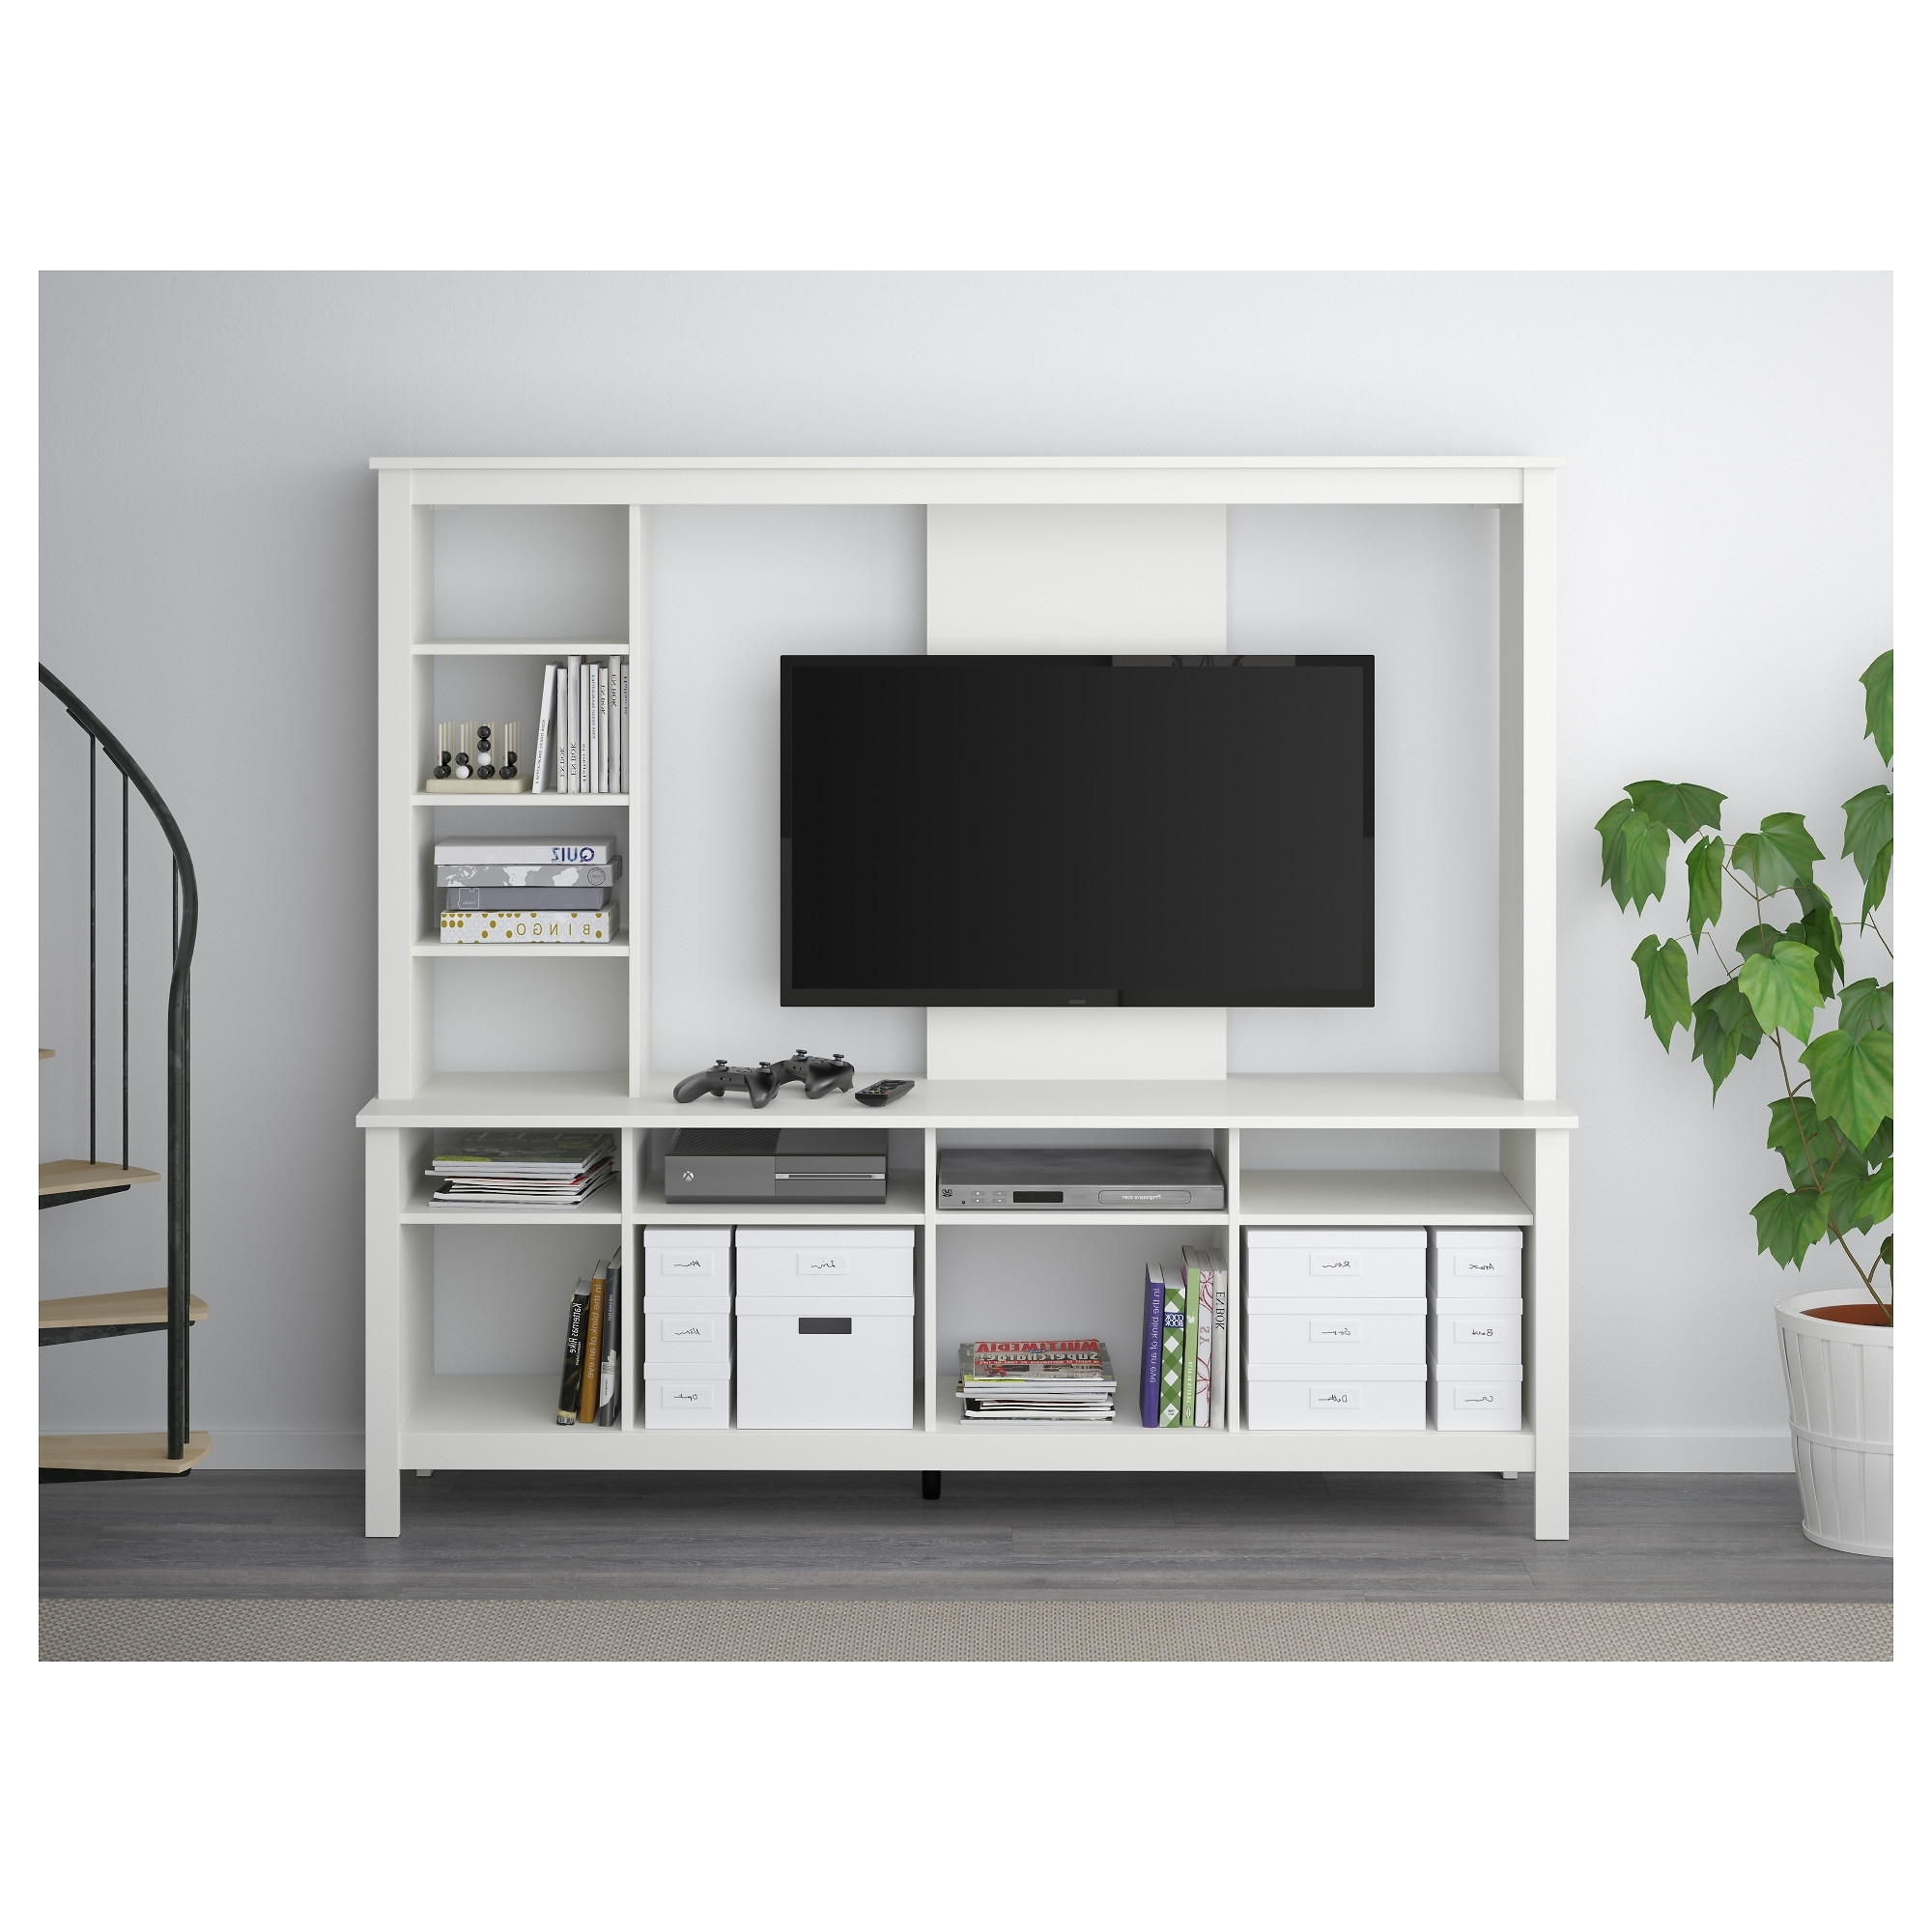 Most Popular Tv Storage Units With Regard To Tomnäs Tv Storage Unit White 183x48x163 Cm – Ikea (View 7 of 15)